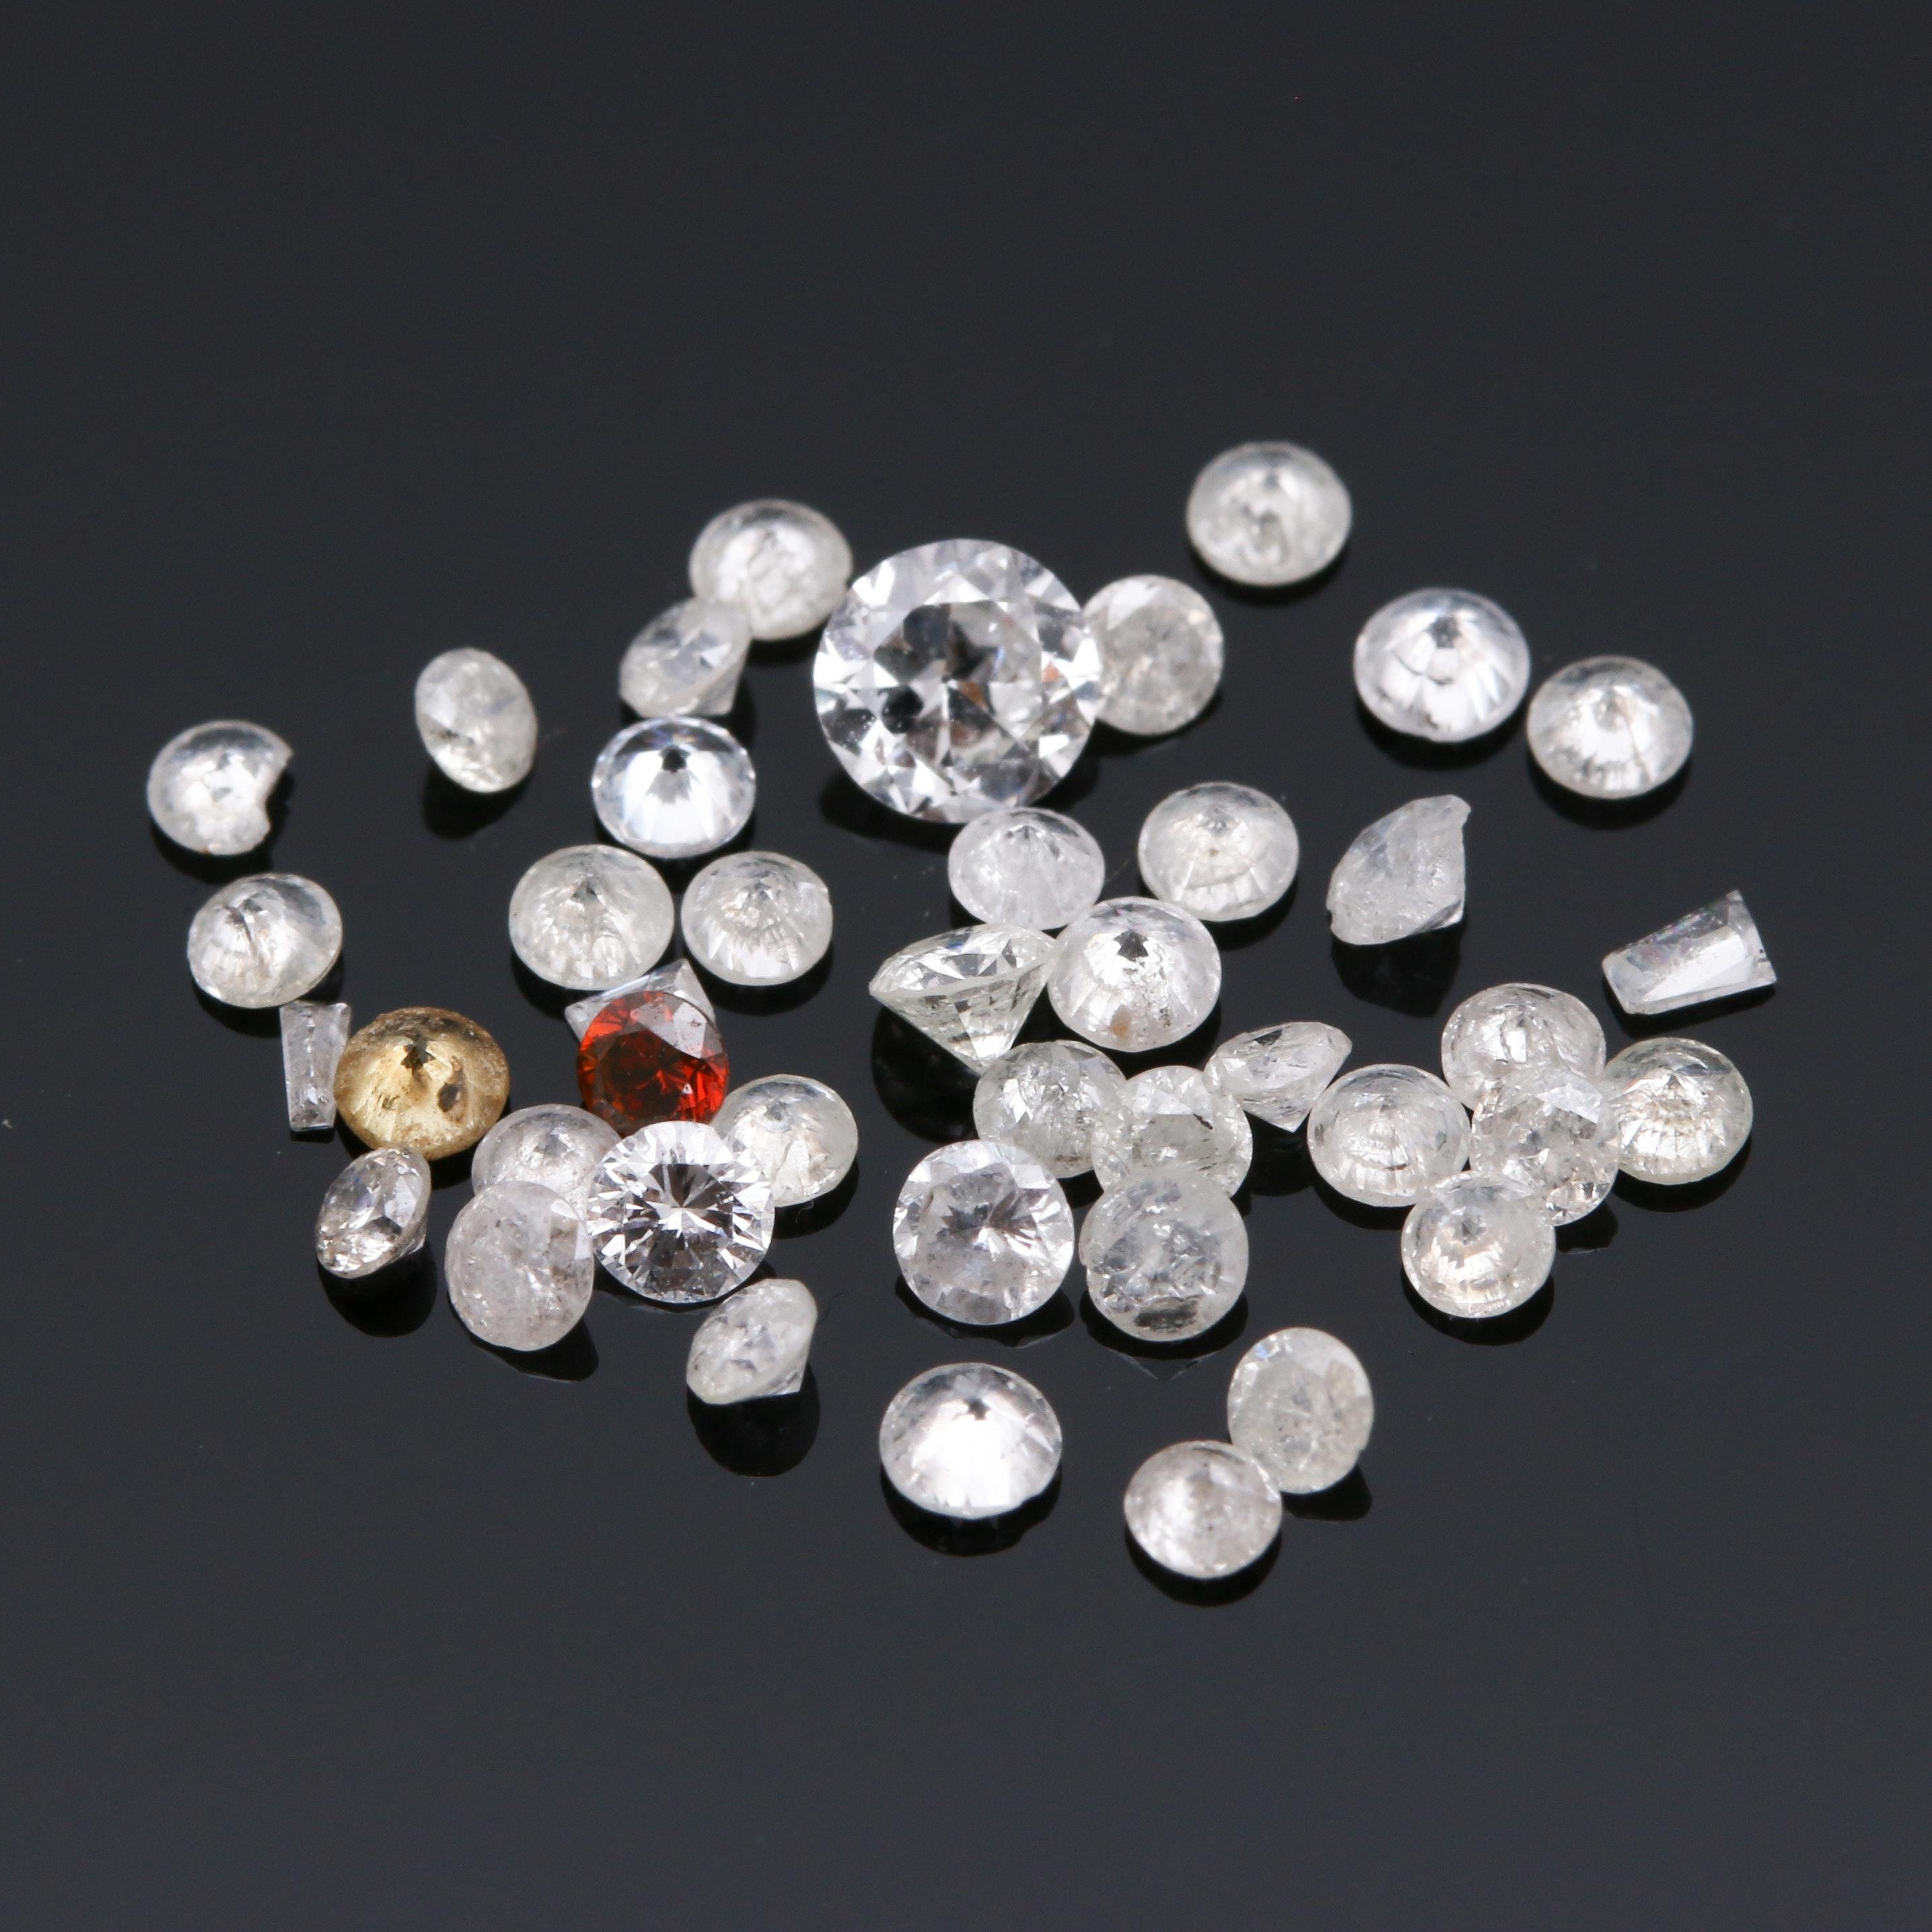 1.02 CTW Loose Diamond Assortment